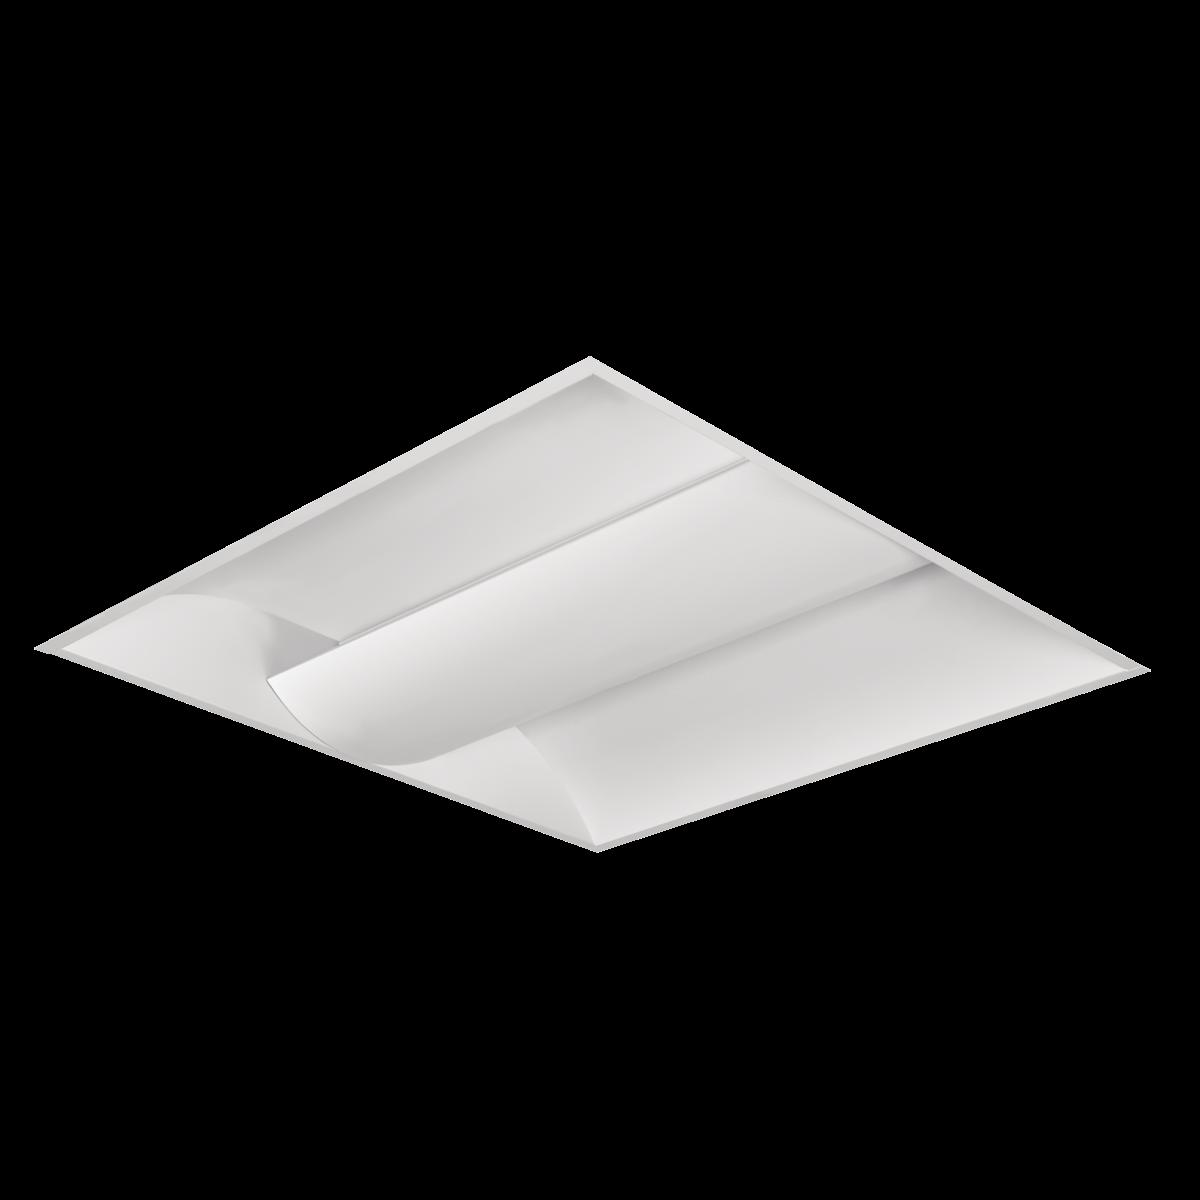 Luminaire Indirect se rapportant à indirect light luminaires - lug